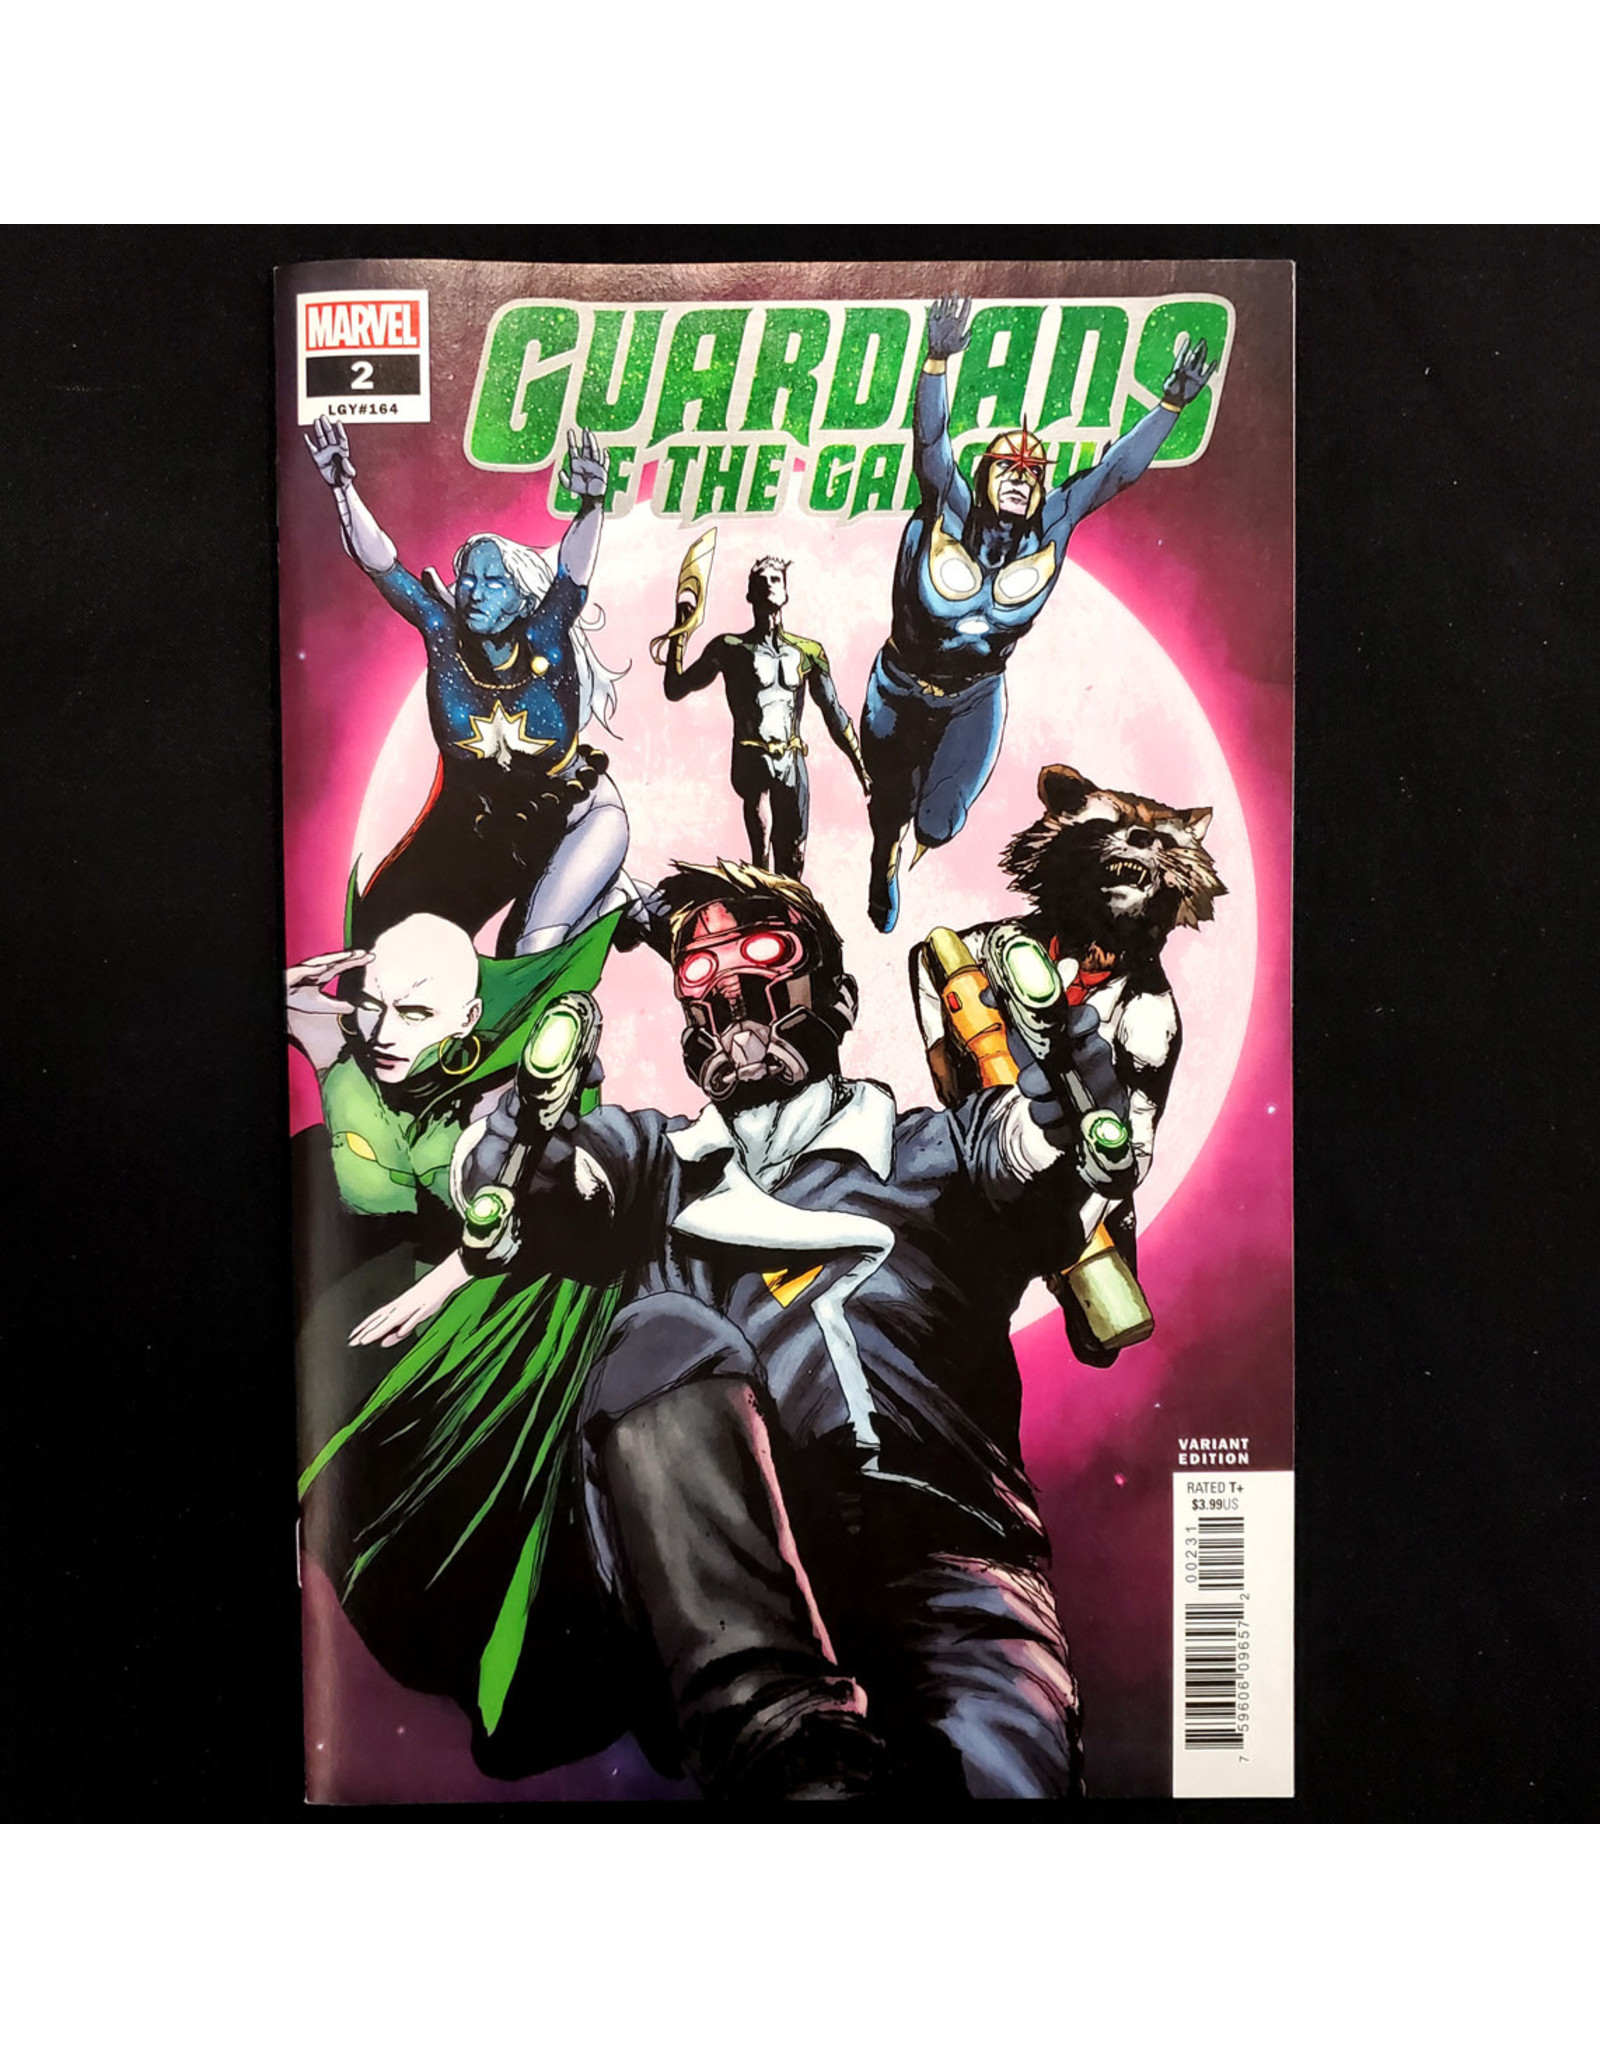 MARVEL COMICS GUARDIANS OF THE GALAXY #2 SORRENTINO VARIANT